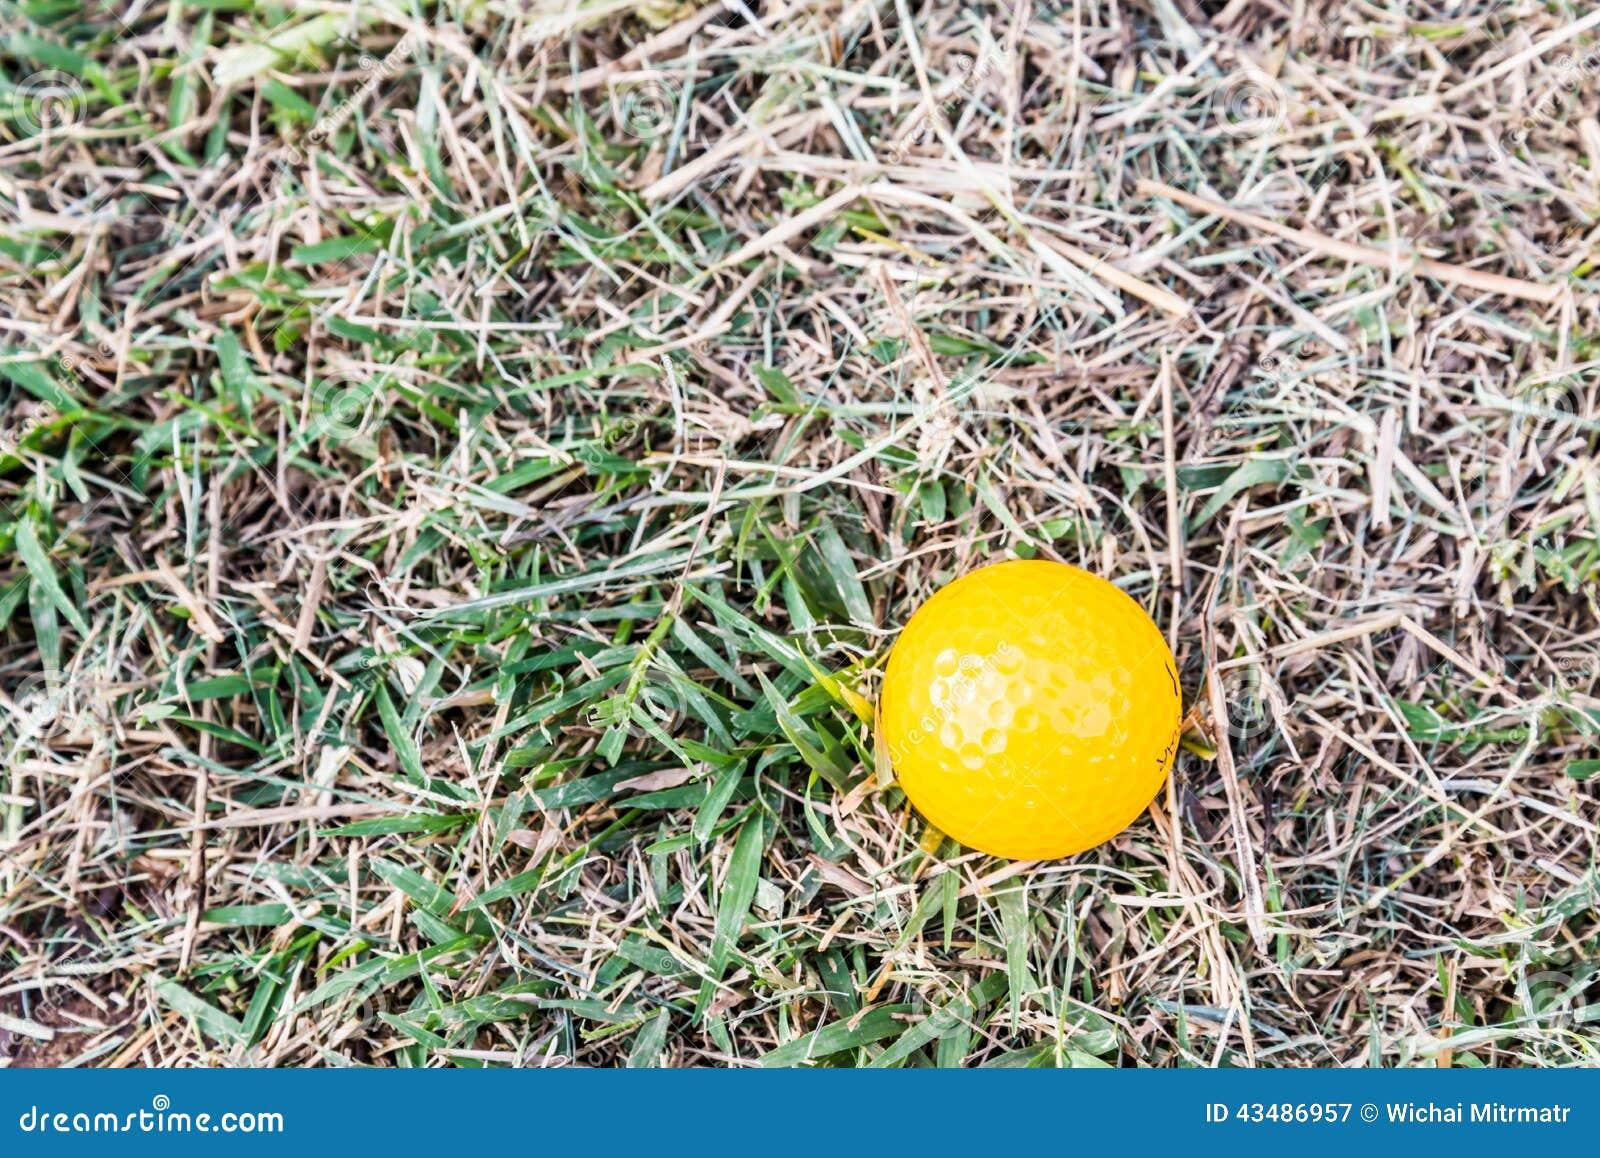 Bola de mini golfe amarela no áspero